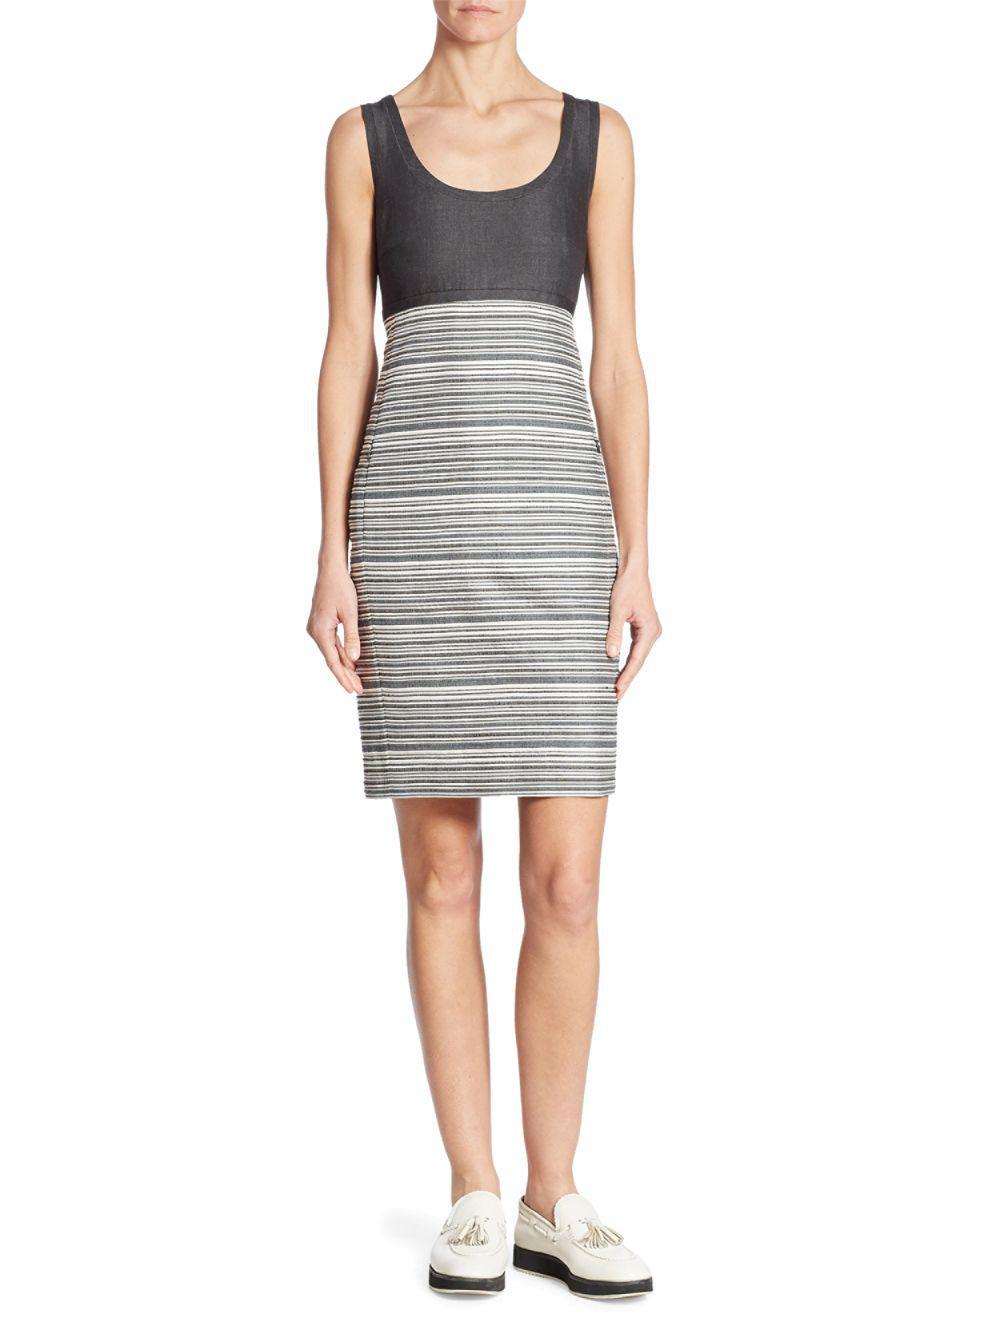 8ff0826b13 Akris Sleeveless Striped Dress in Black - Save 2% - Lyst